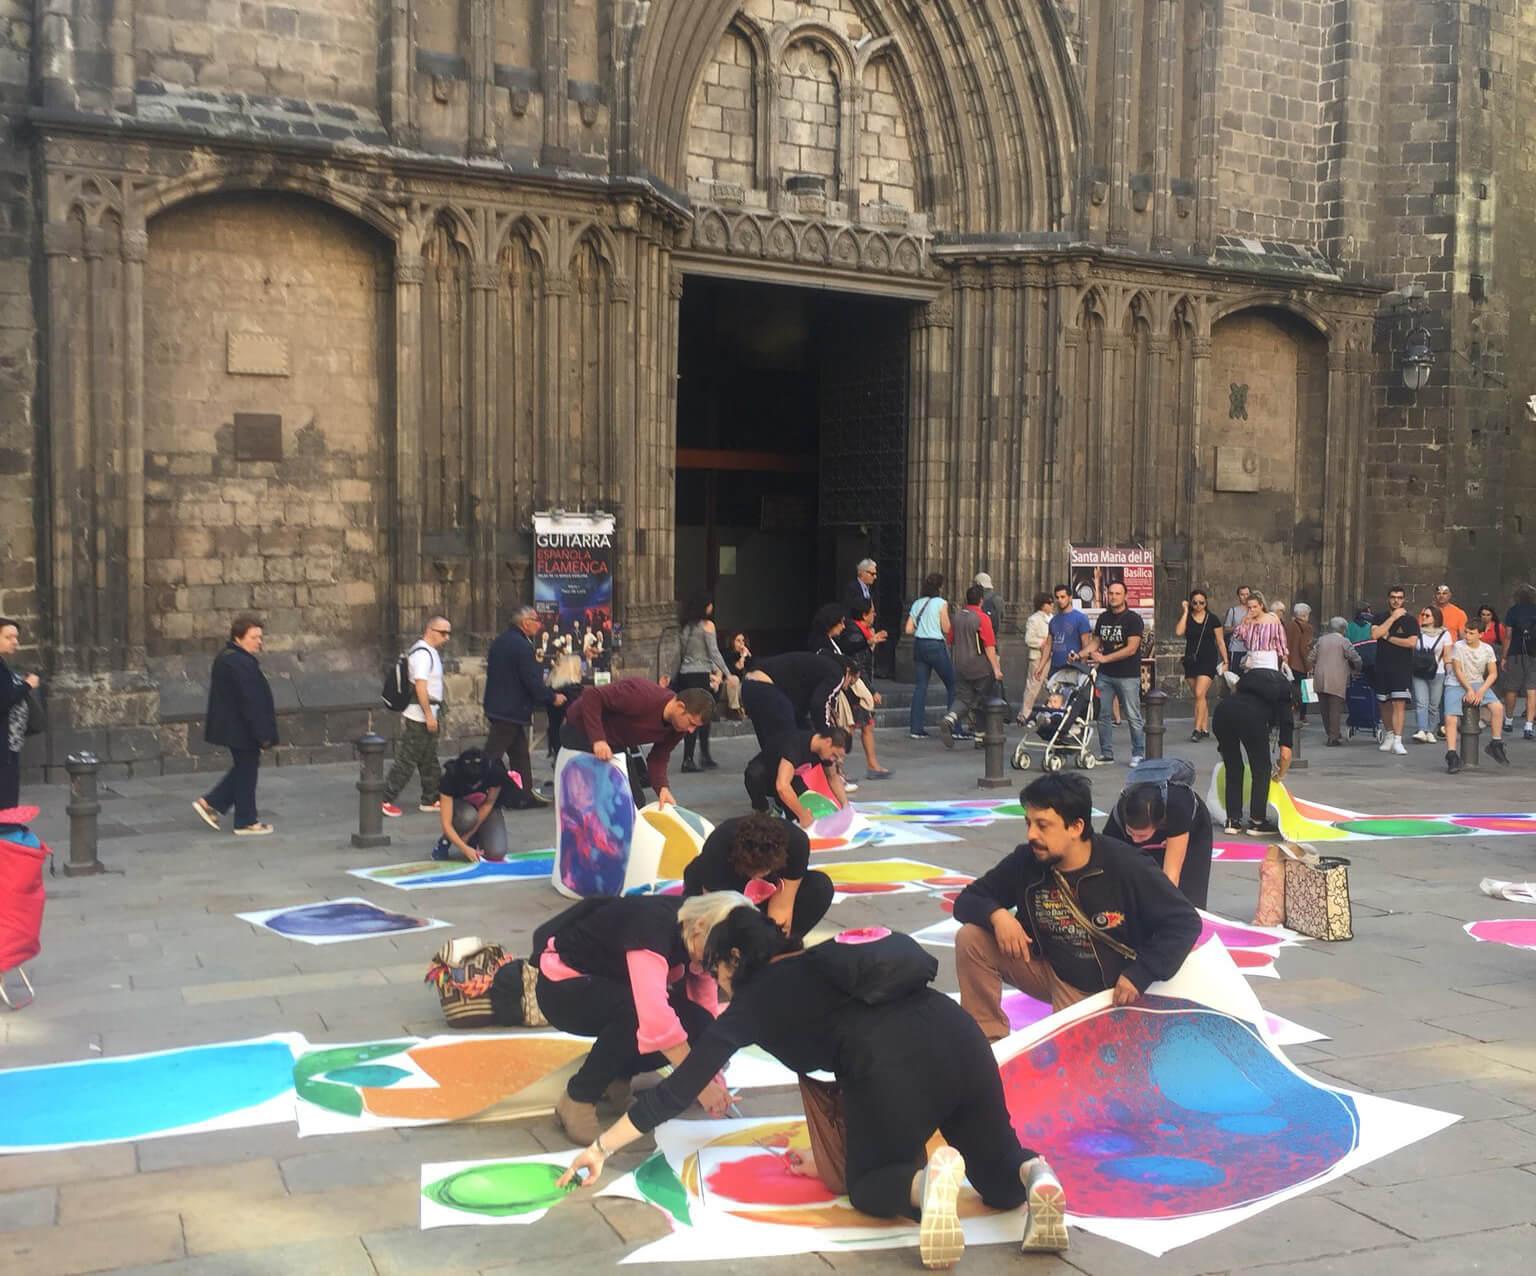 From Bubble. Pegada de Bubbles delante de la Catedral de Barcelona